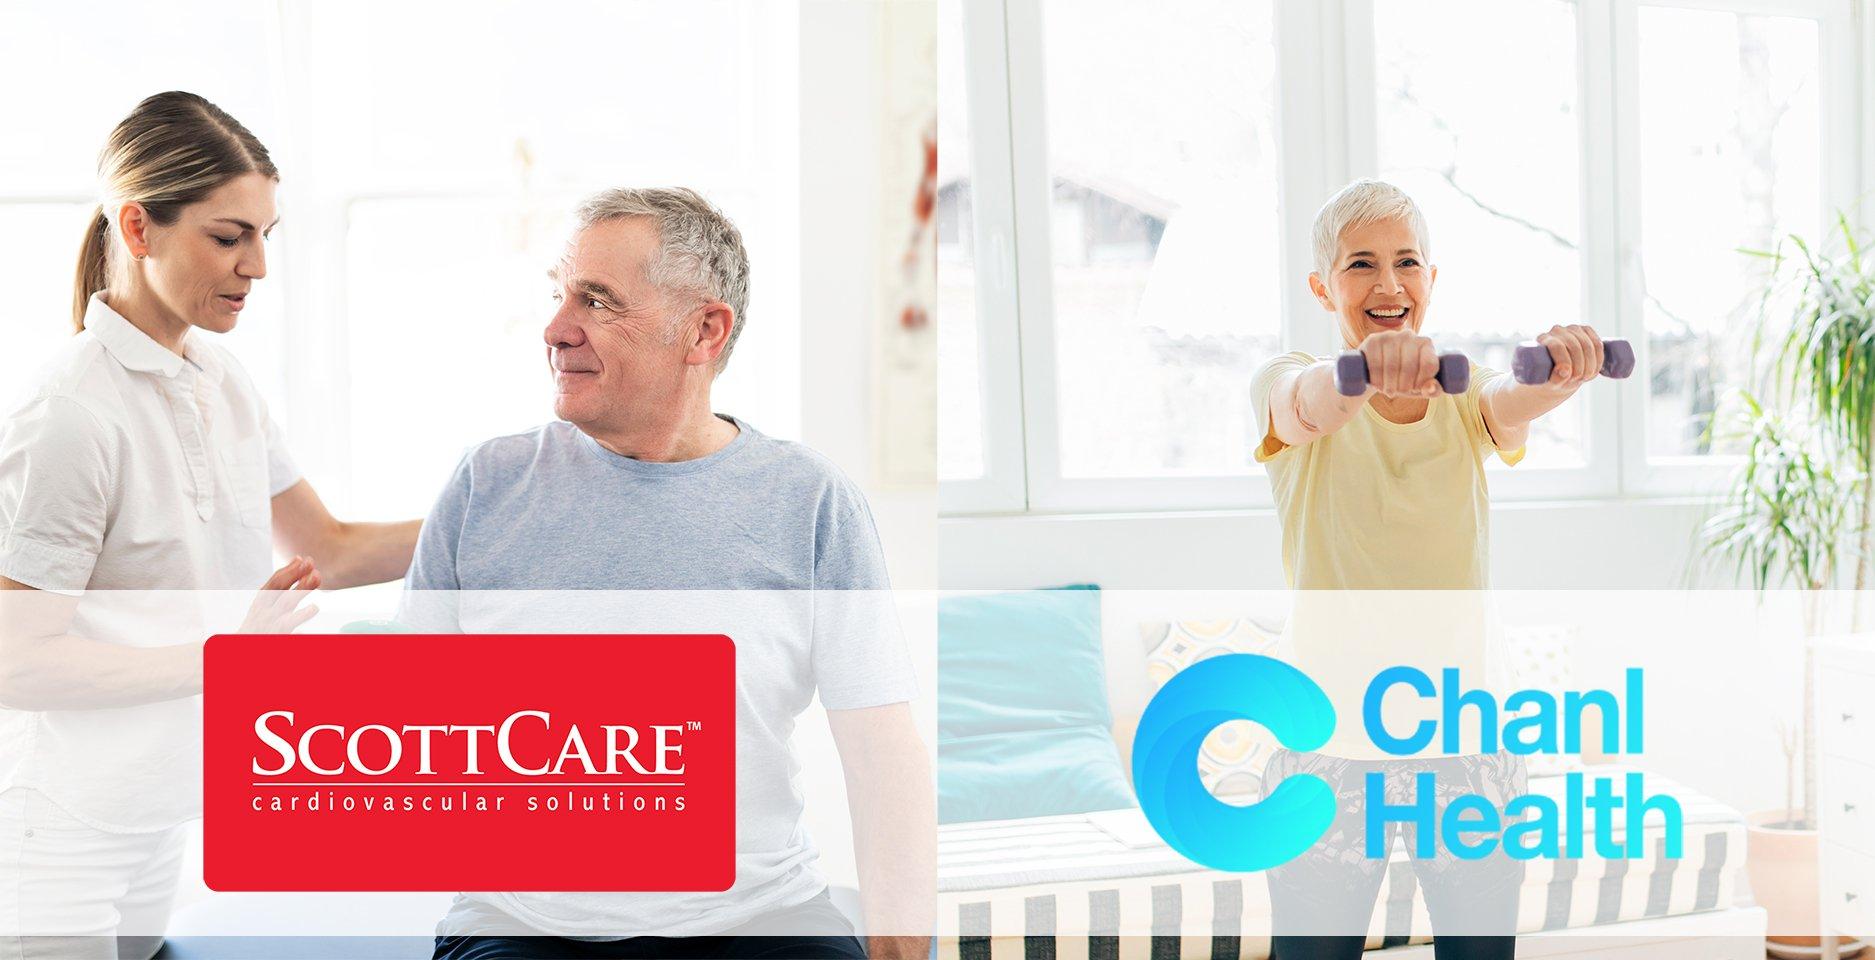 ScottCare and Chanl Health Hybrid Cardiac Rehab